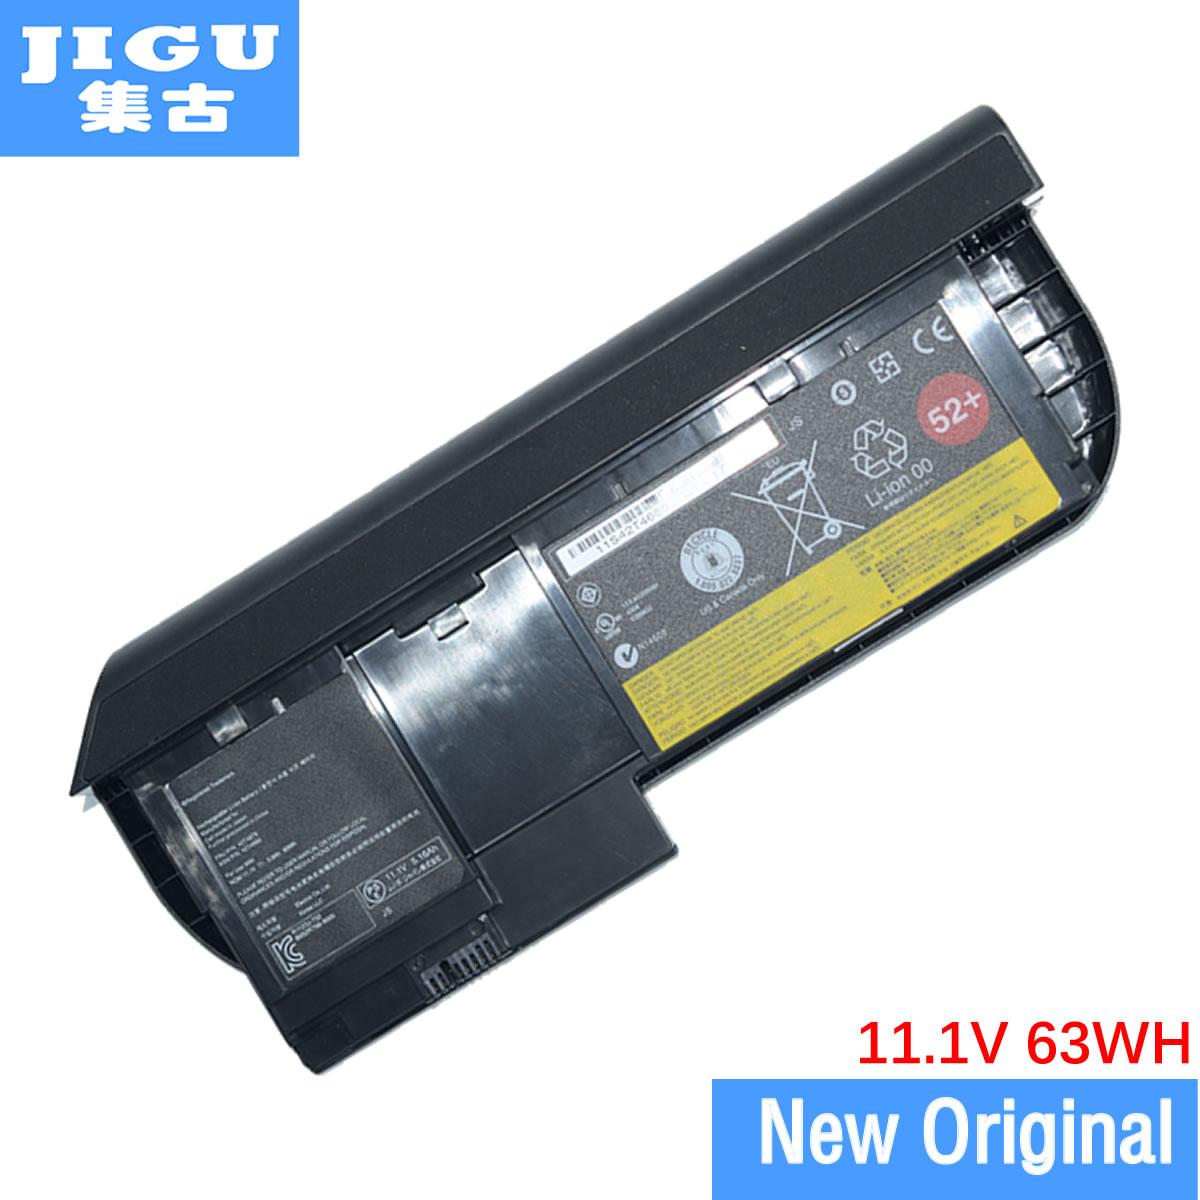 JIGU 11,1 V 63Wh Original nuevo batería portátil de alta calidad para Lenovo para Thinkpad X220T 42T4879 42T4881